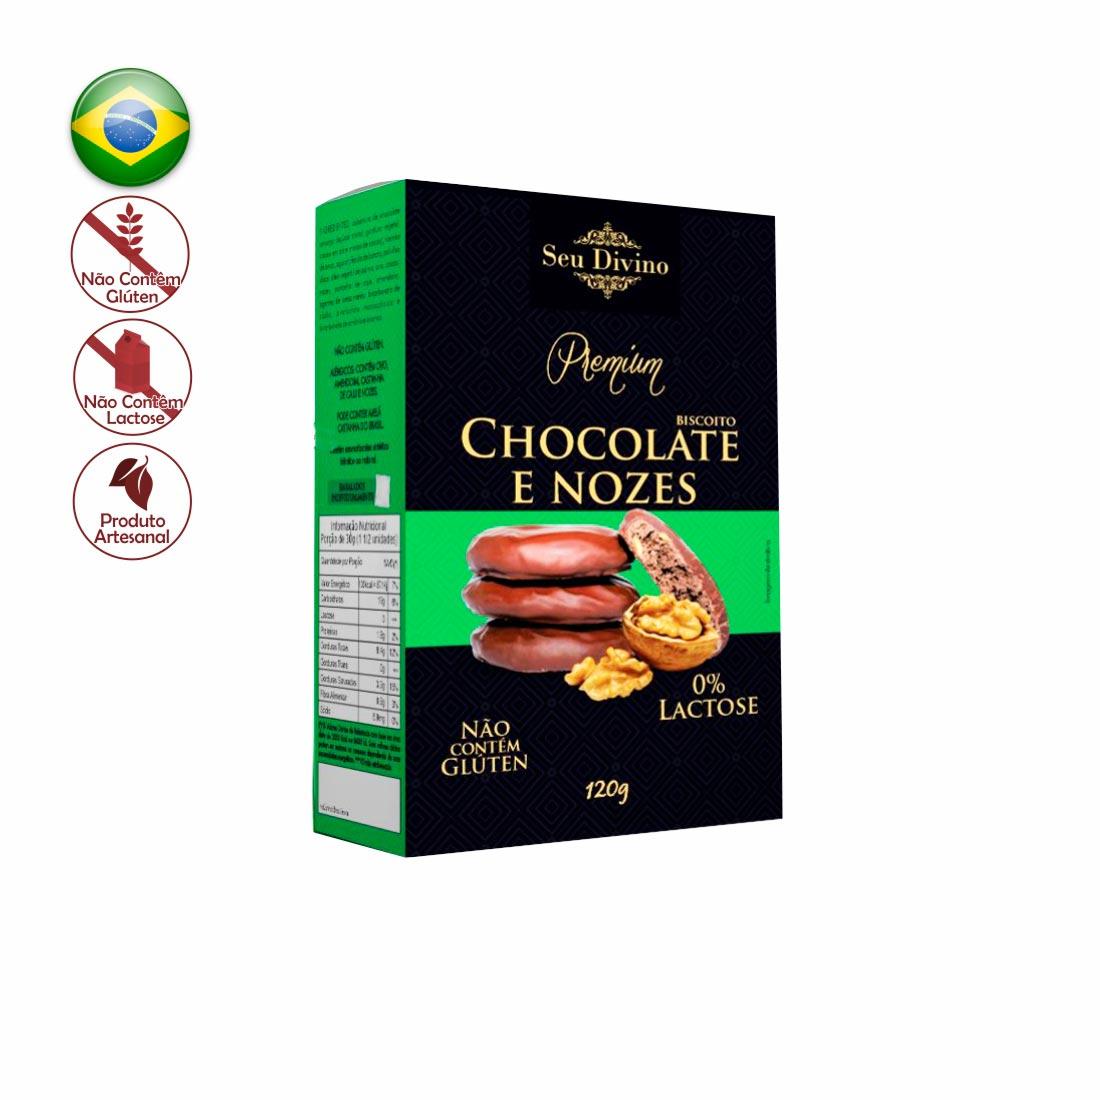 BISCOITO CHOCOLATE C/ NOZES PREMIUM SEU DIVINO SEM GLÚTEN E ZERO LACTOSE 120G